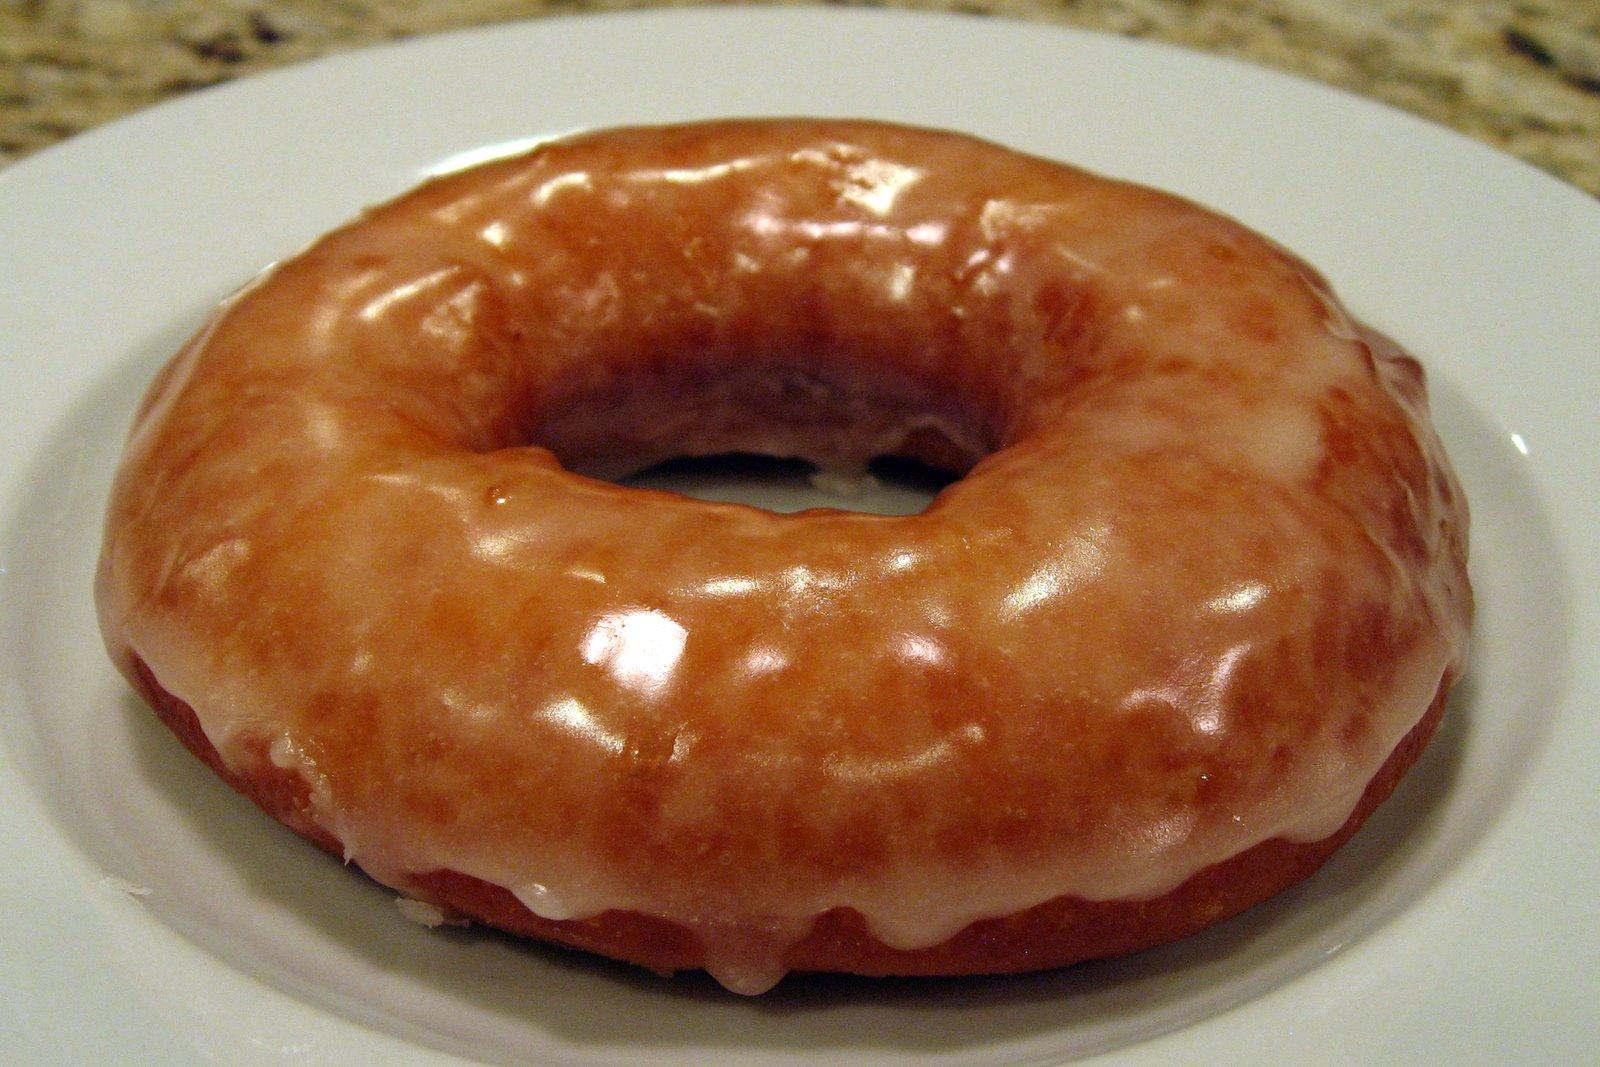 Dinner Delish: Top Pot Raised Glazed Ring Doughnuts